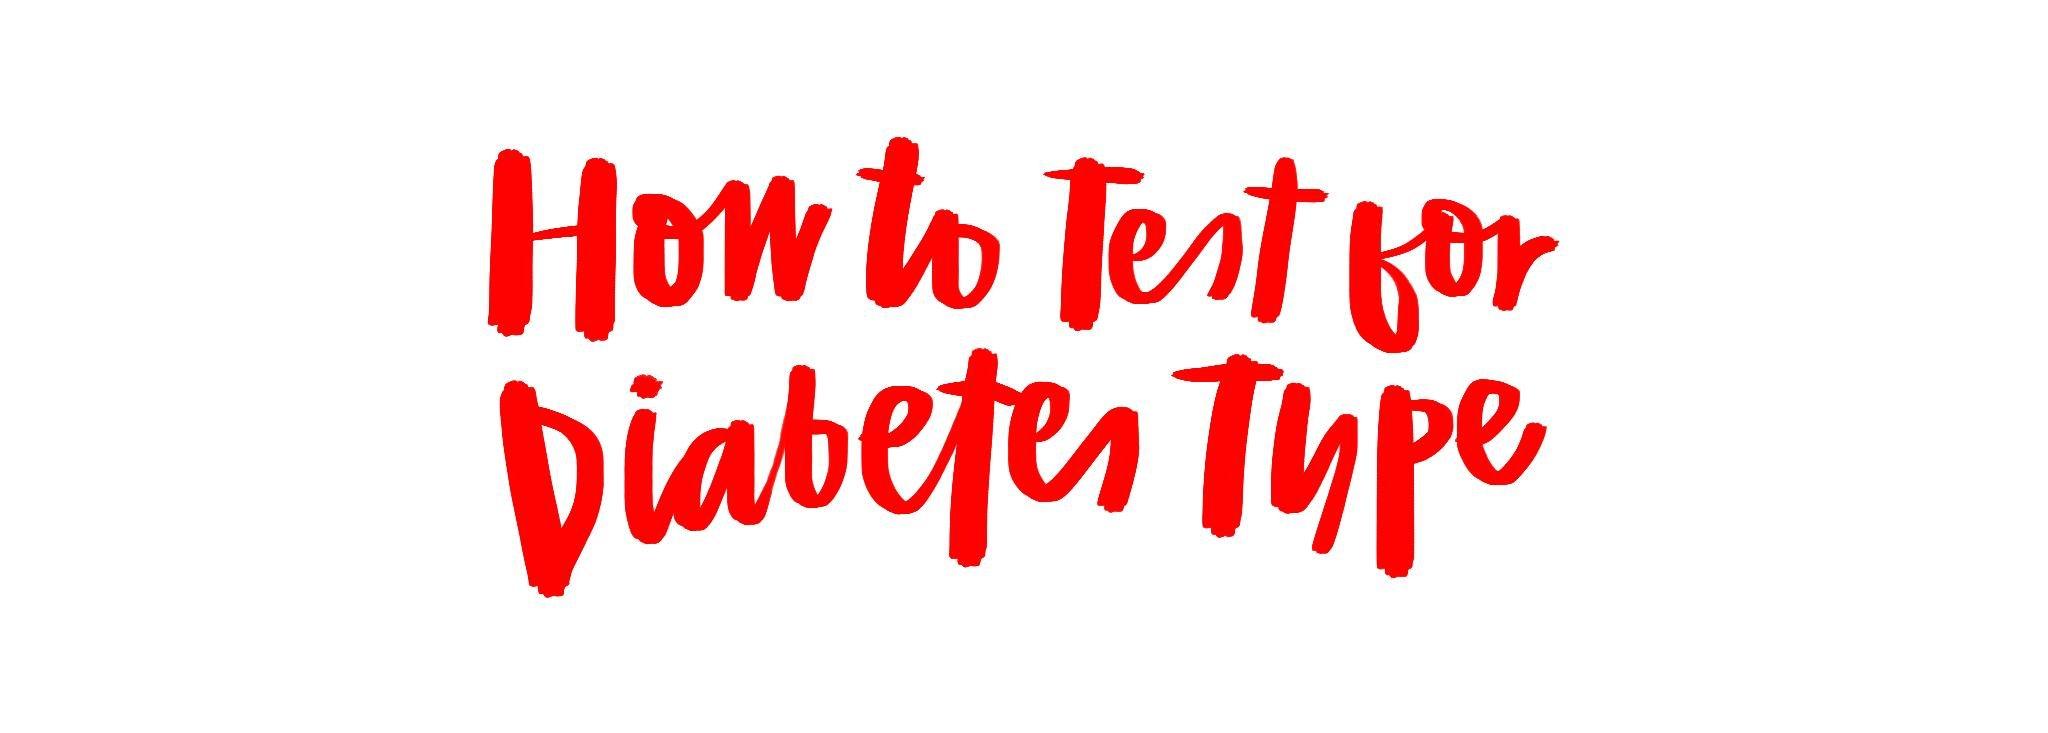 What Is Ogtt Test In Diabetes?